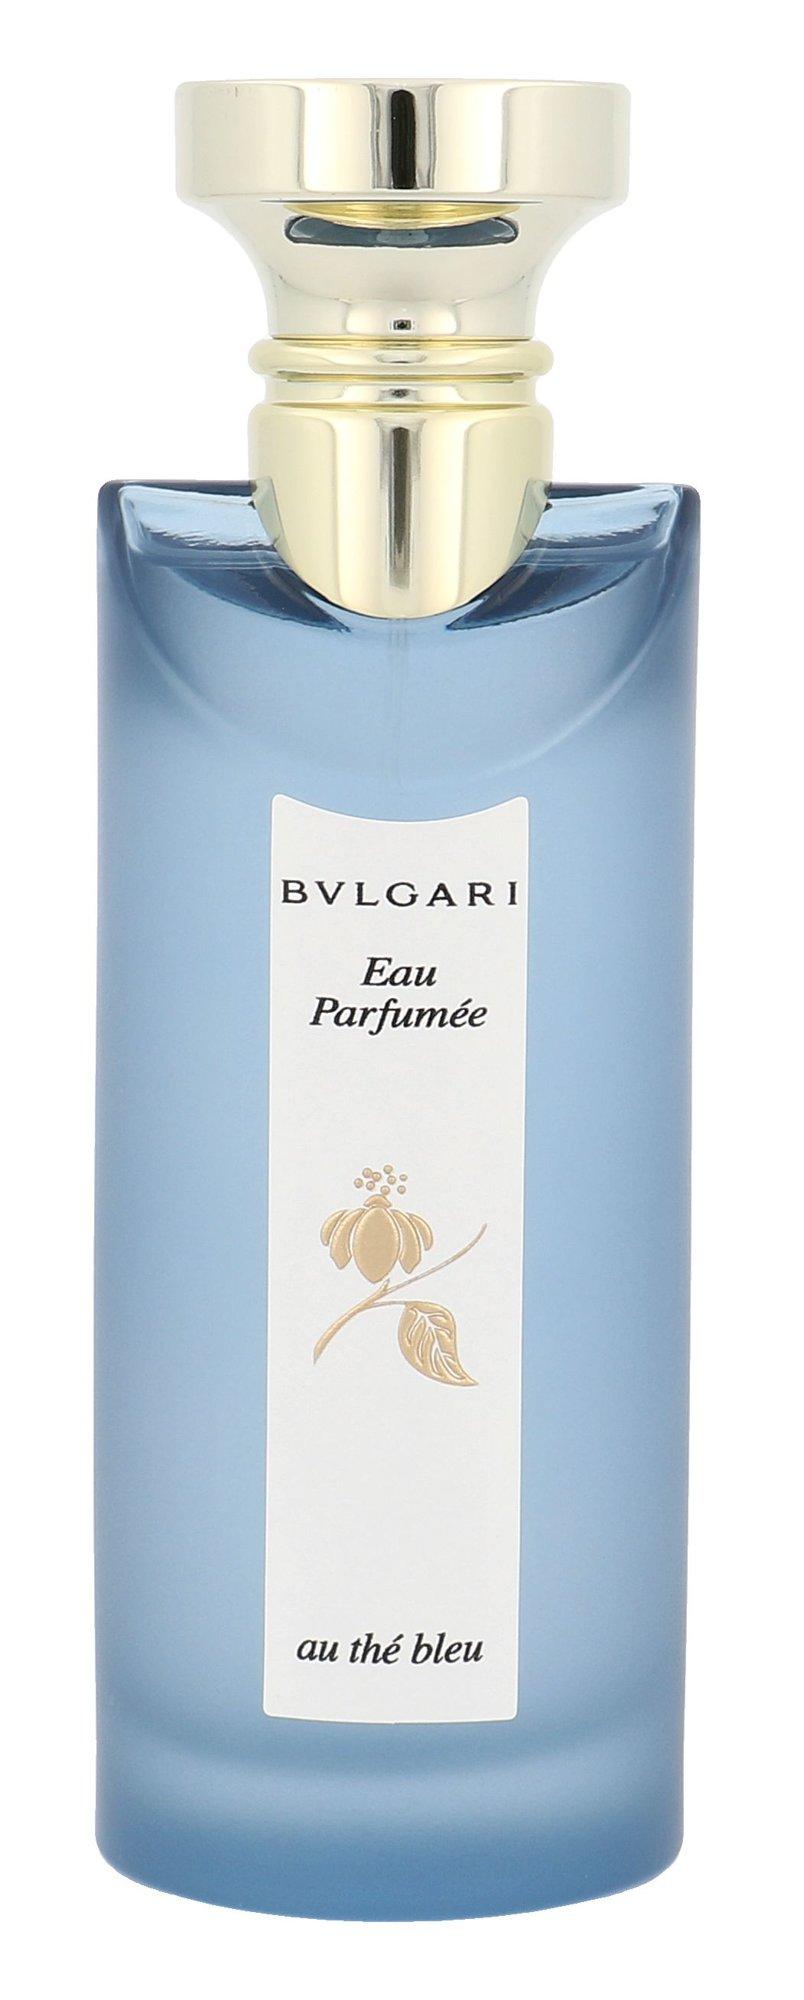 Odekolonai Bvlgari Eau Parfumée au Thé Bleu